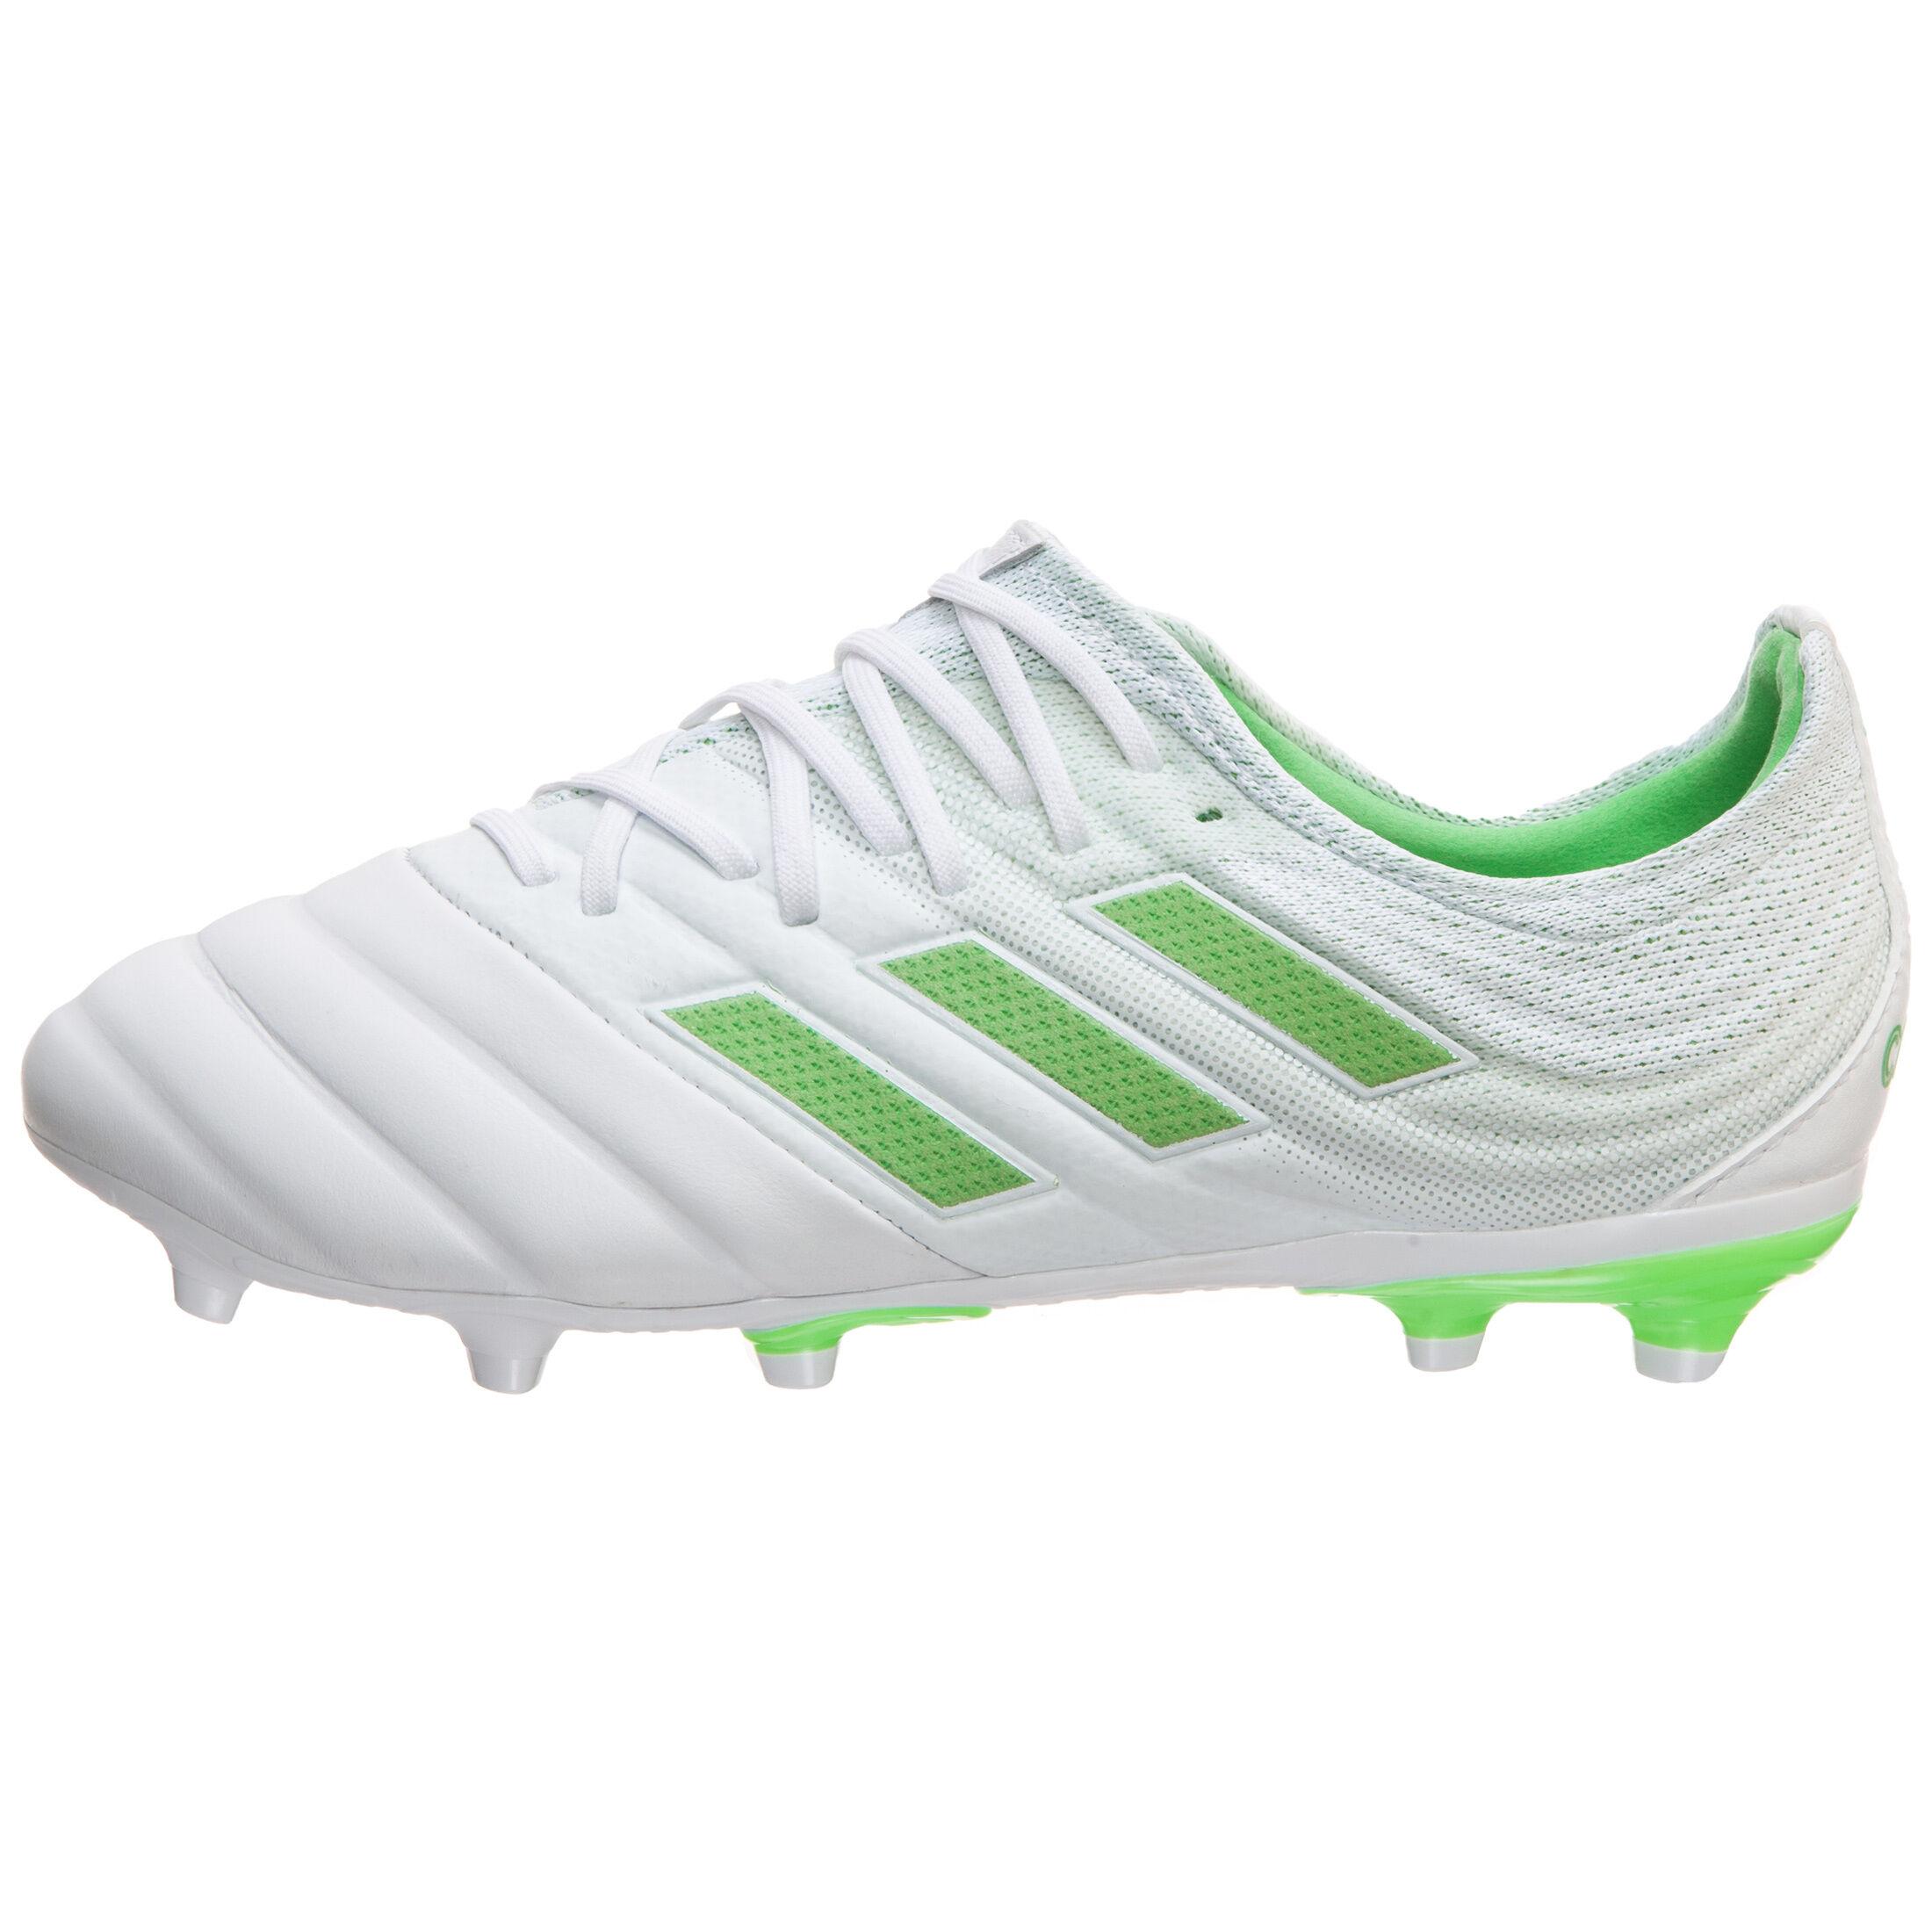 adidas Performance Copa 19.1 FG Fußballschuh Kinder bei